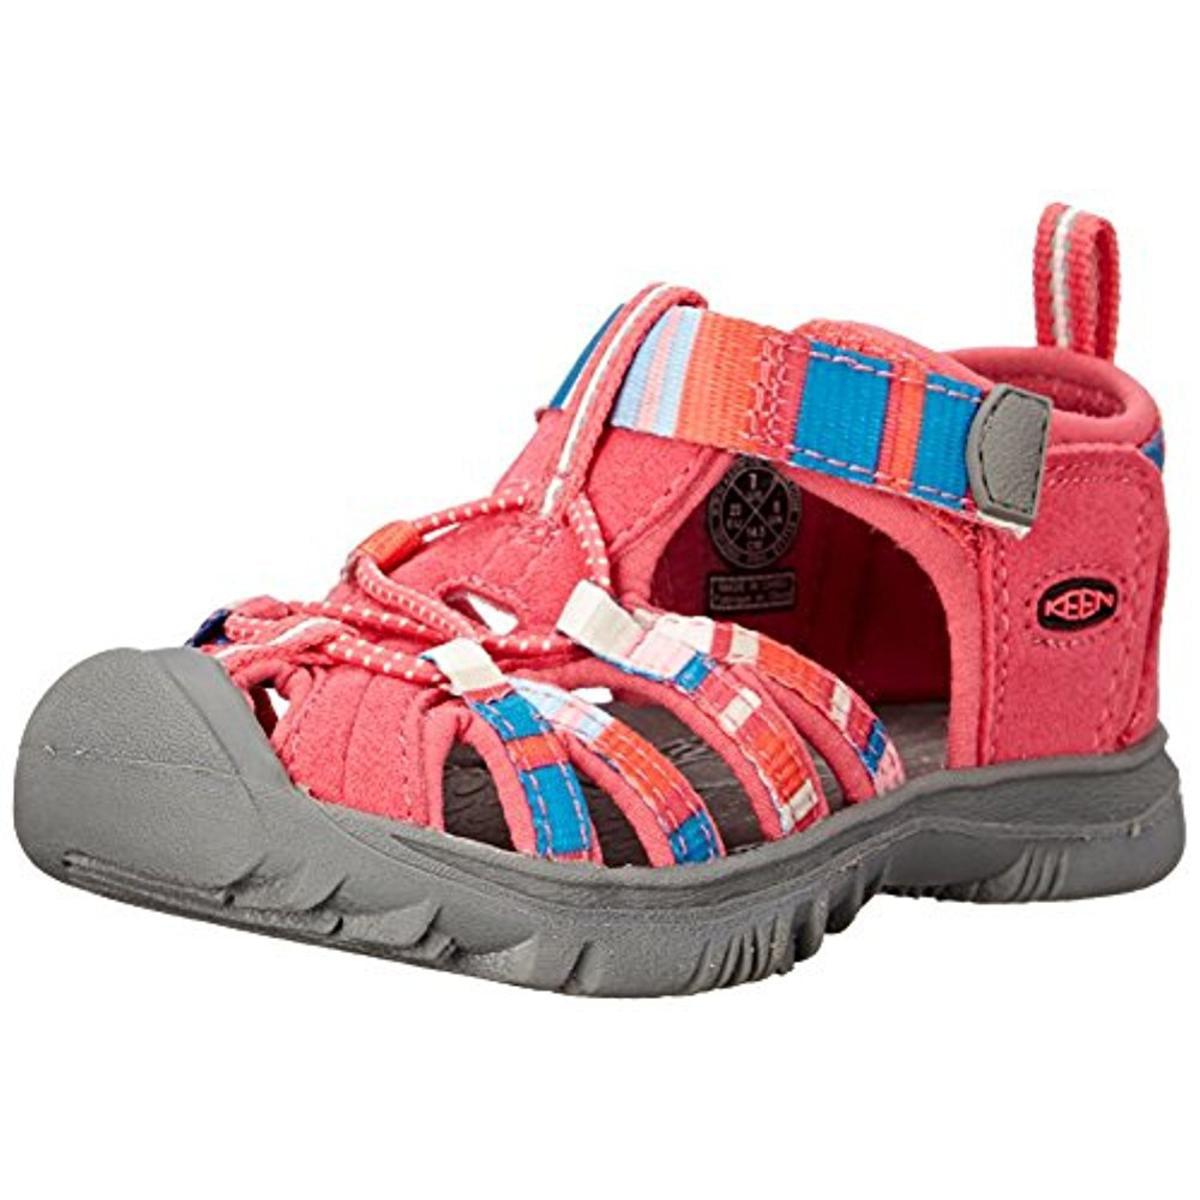 Keen Girls Whisper Toddler Sport Fisherman Sandals by Keen